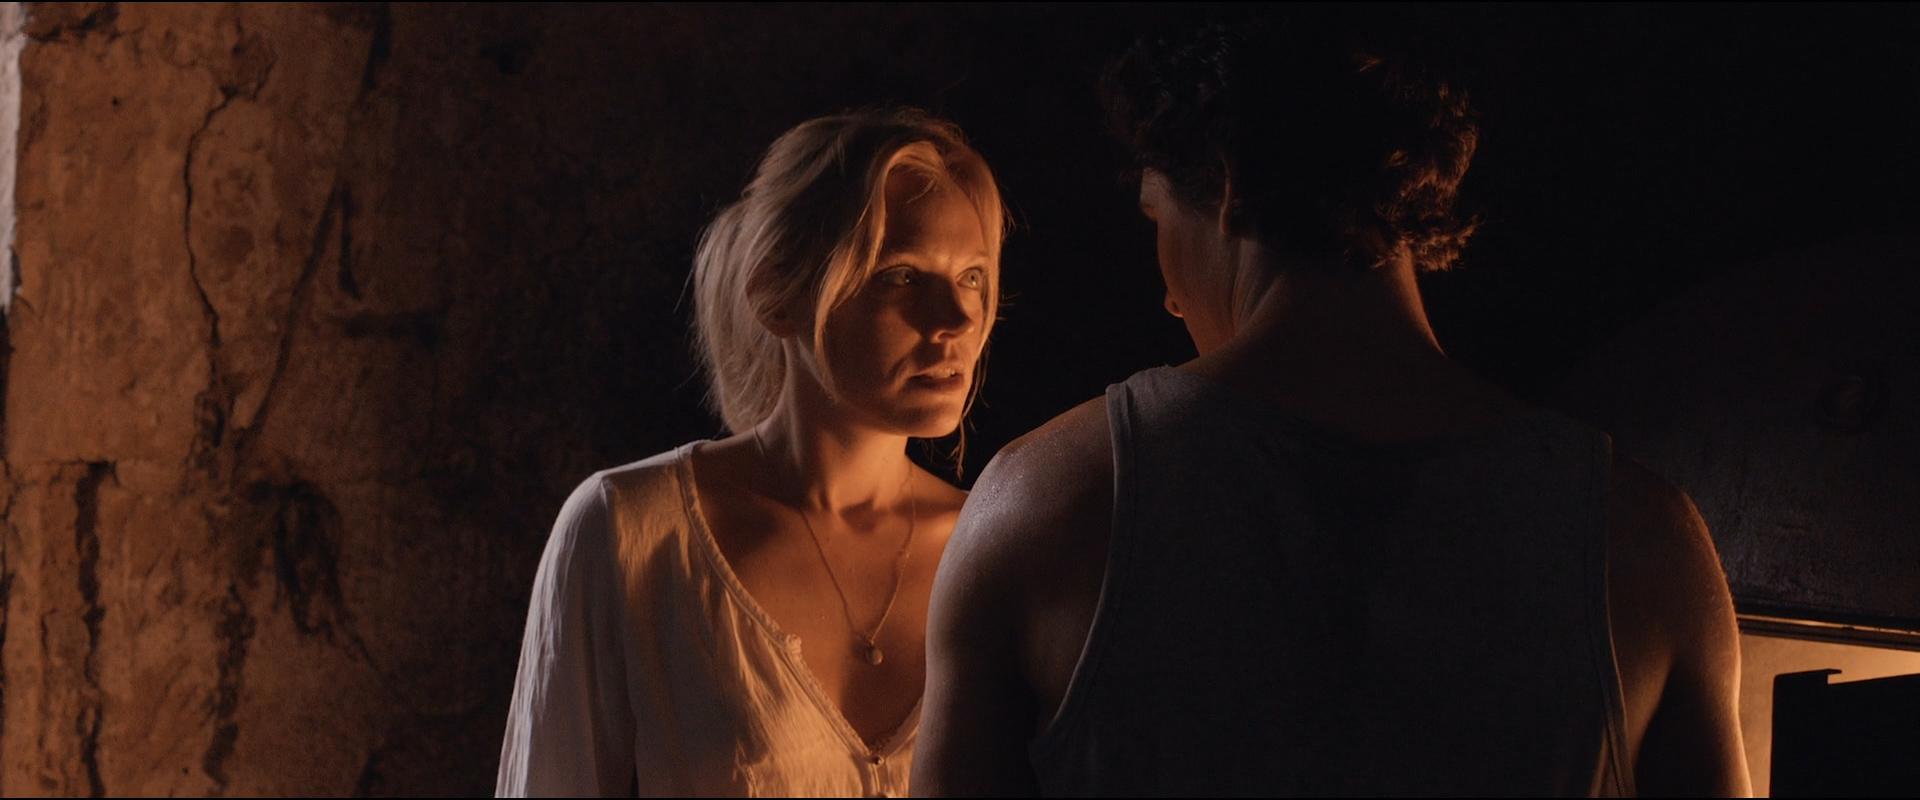 Loes Haverkort nude hot sex - Rendez-Vous (NL-2015) HD 1080p BluRay (12)